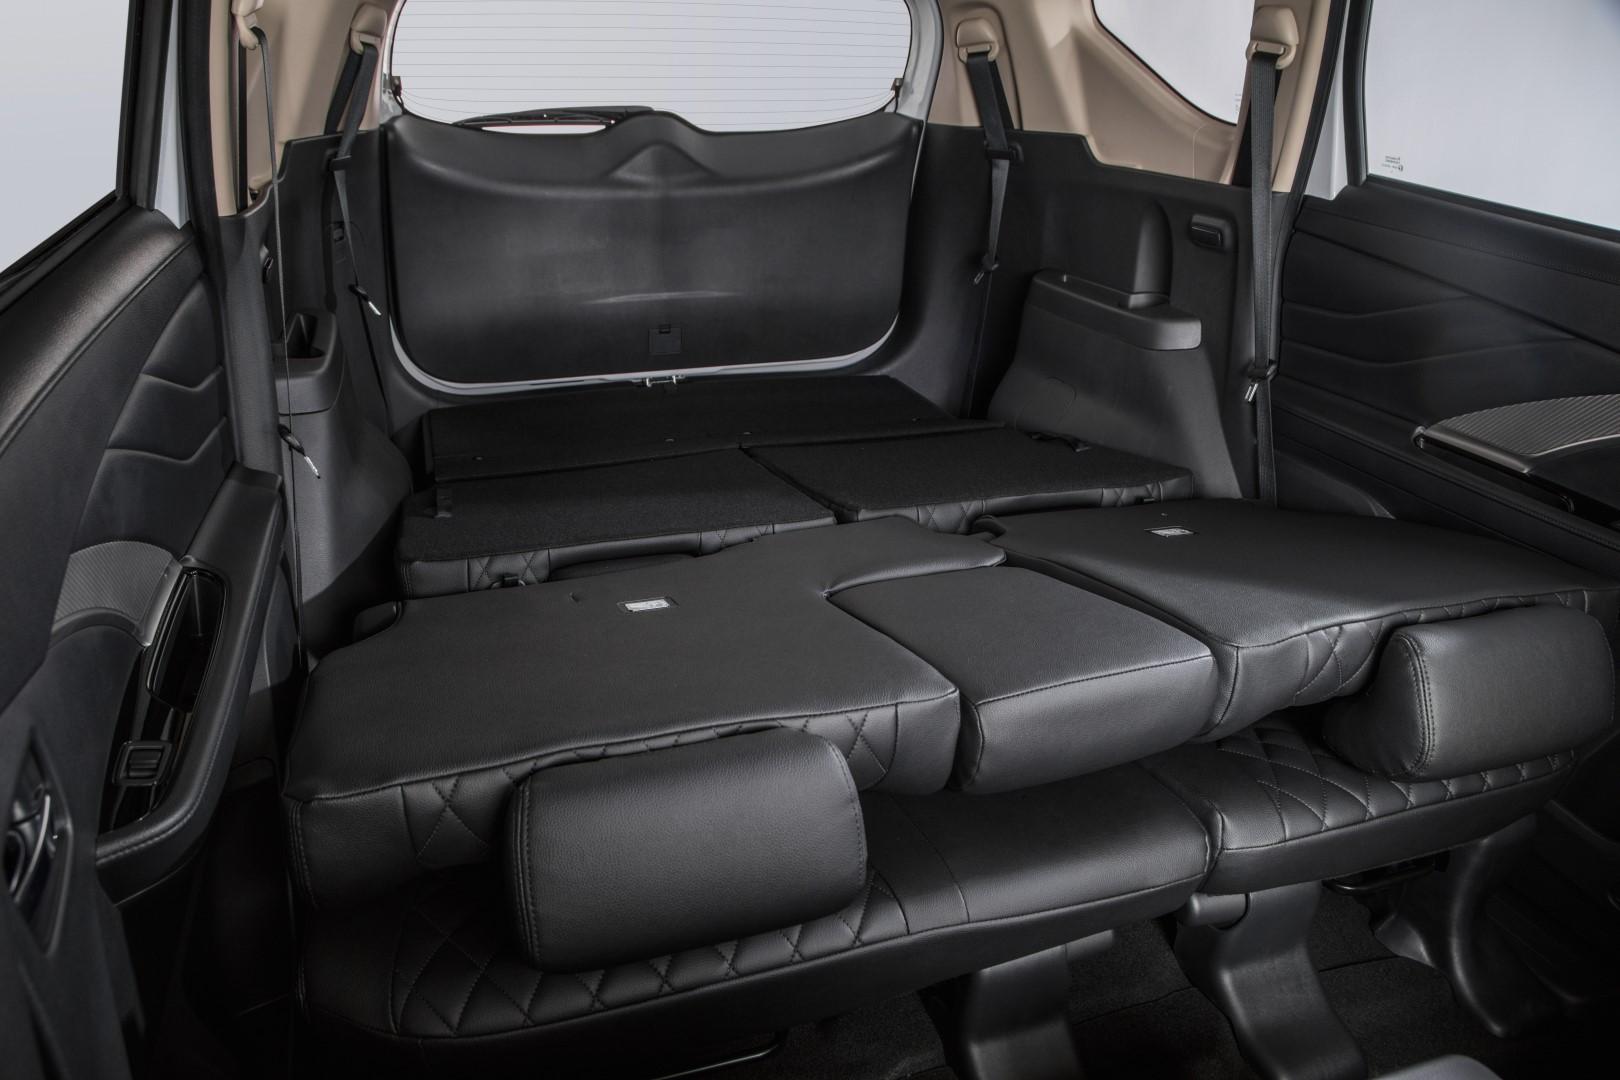 mitsubishi xpander rear seats